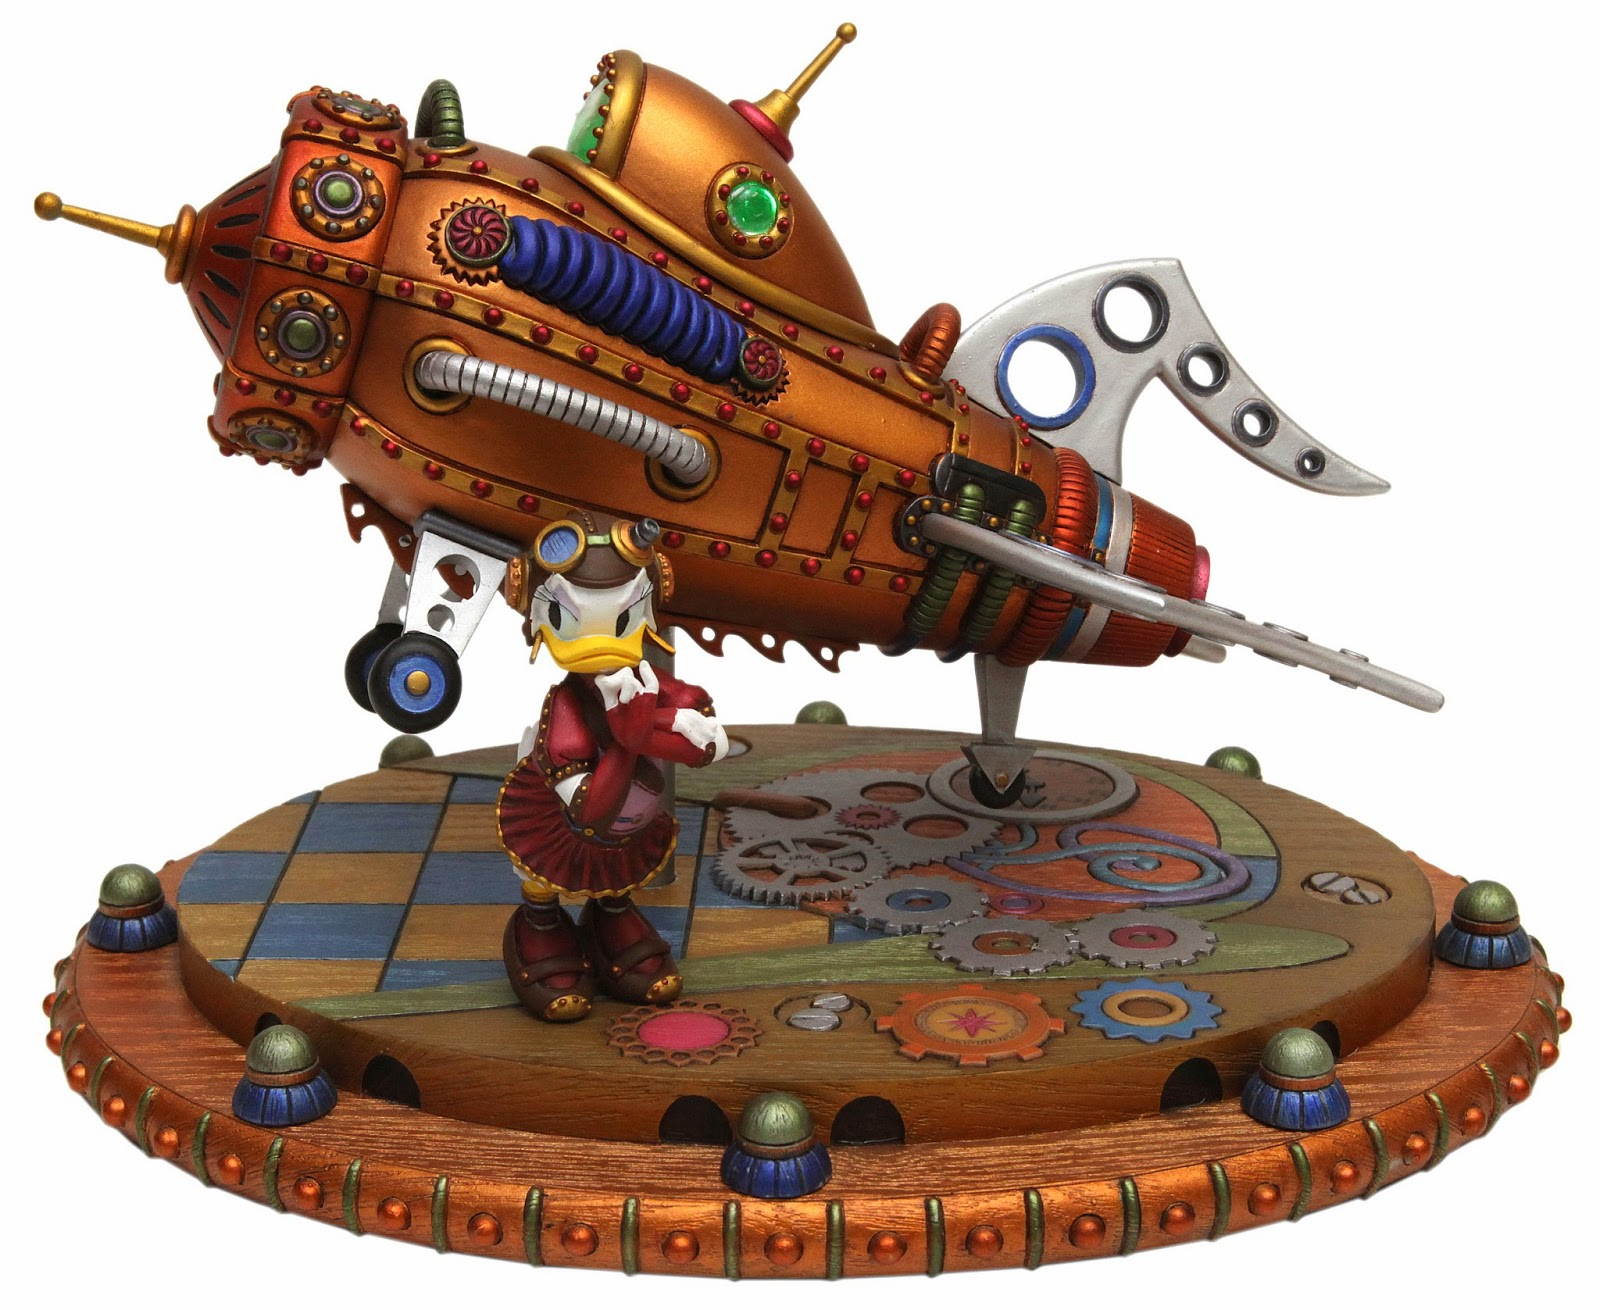 Daisy Duck Rocket Steampunk Gears Mechanical Kingdom Walt Disney World Disneyland statue figure figurine